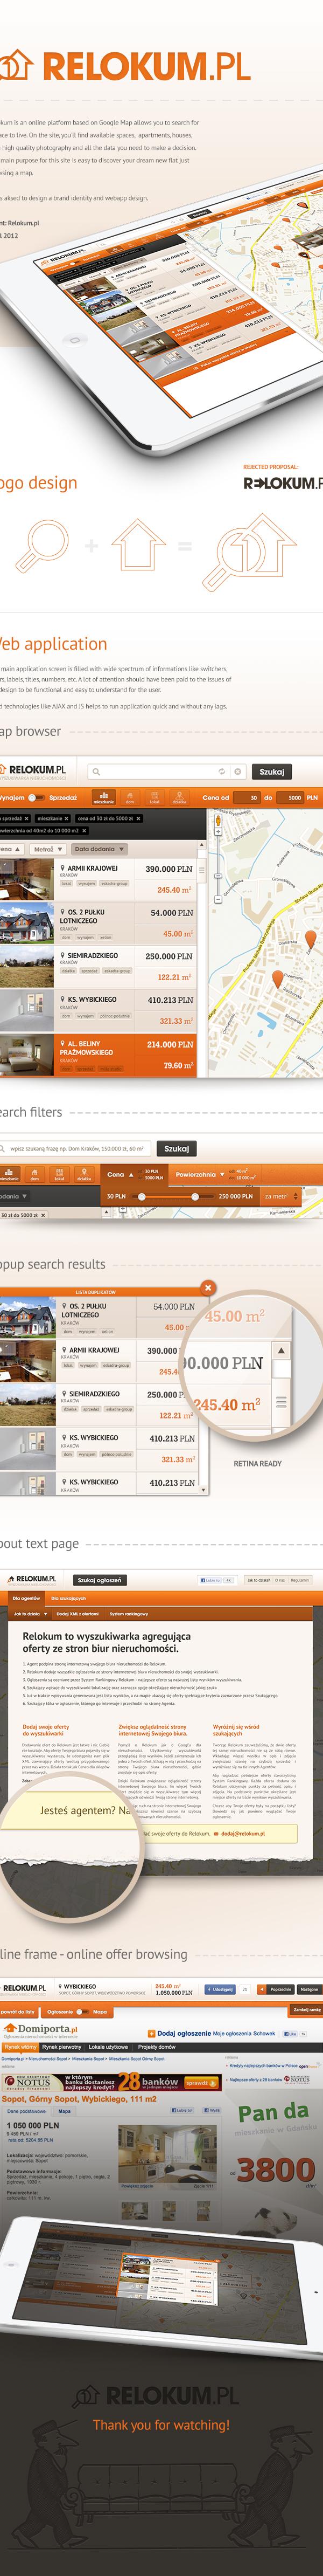 webapp UI ux Platform application rzmota relokum house apartment searching engine